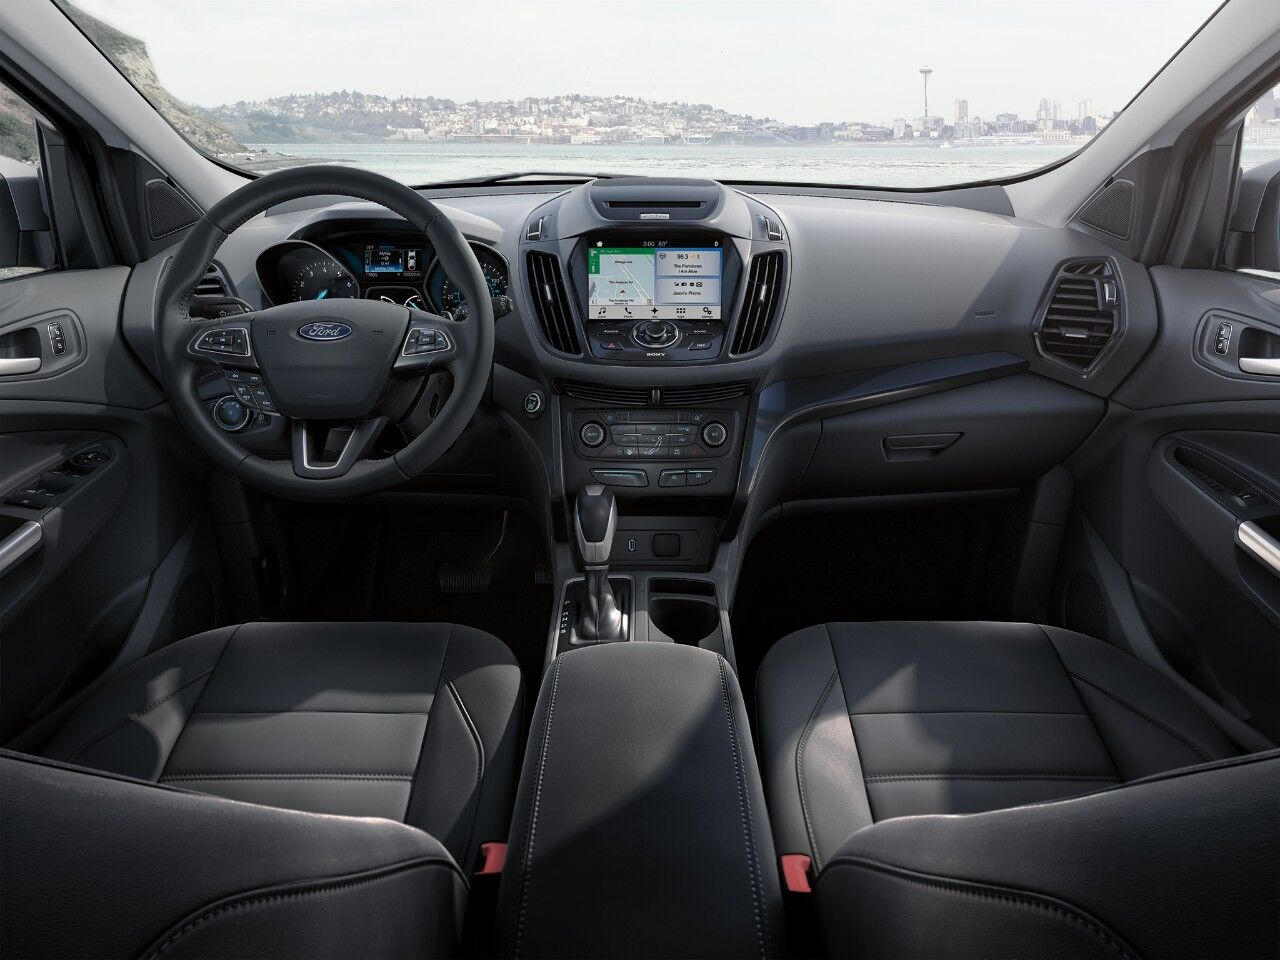 Ford Escape Carlsbad